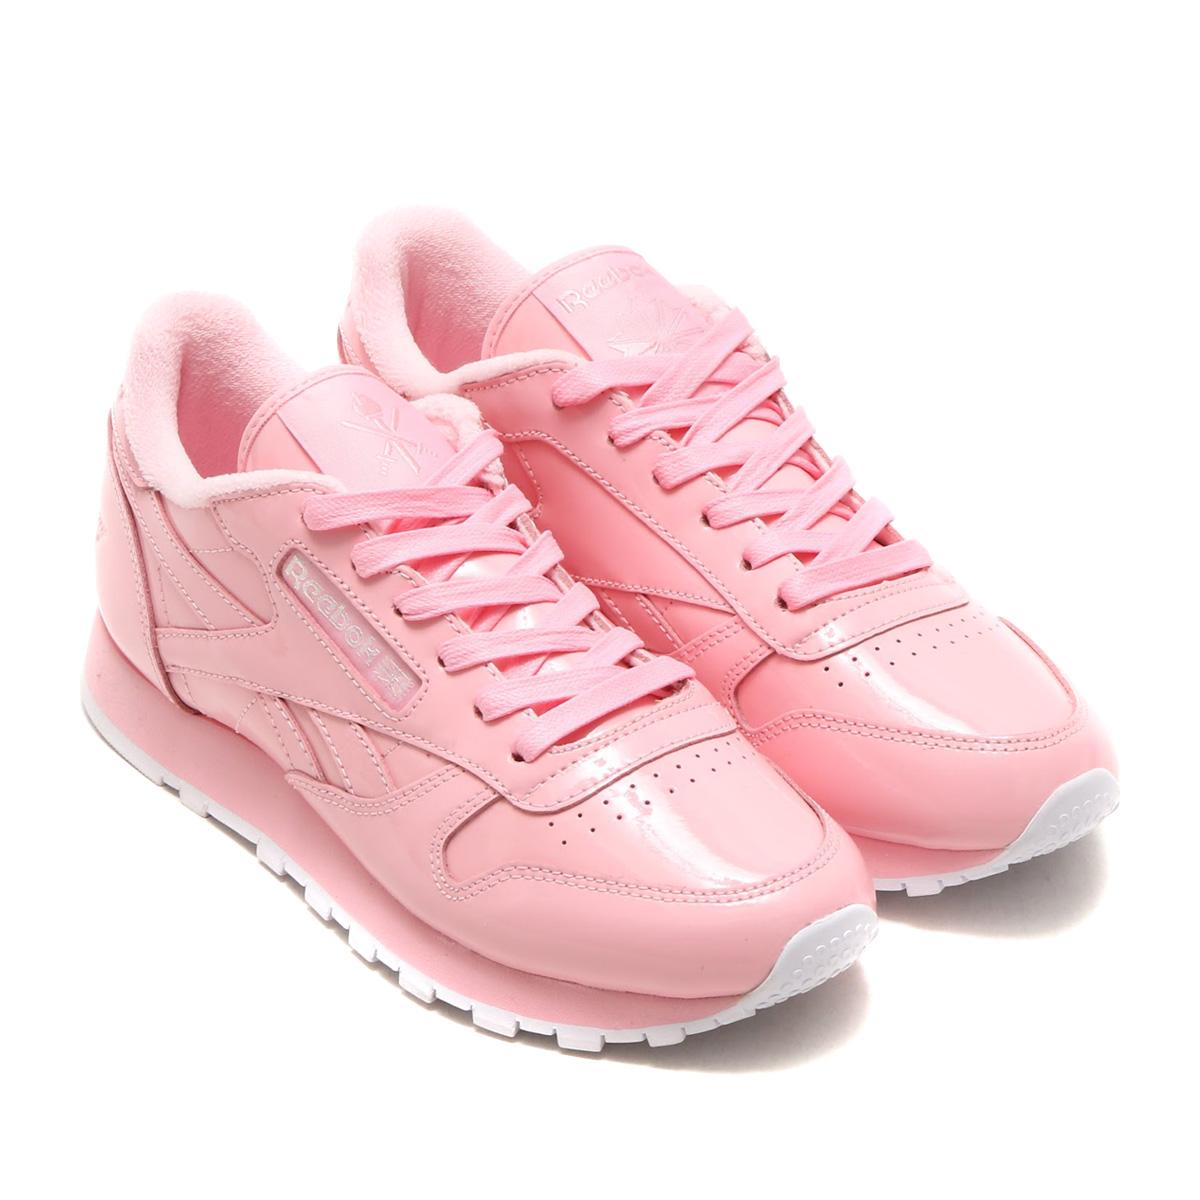 579b36b0dc2 Reebok CLASSIC (Reebok classical music) sneakers.